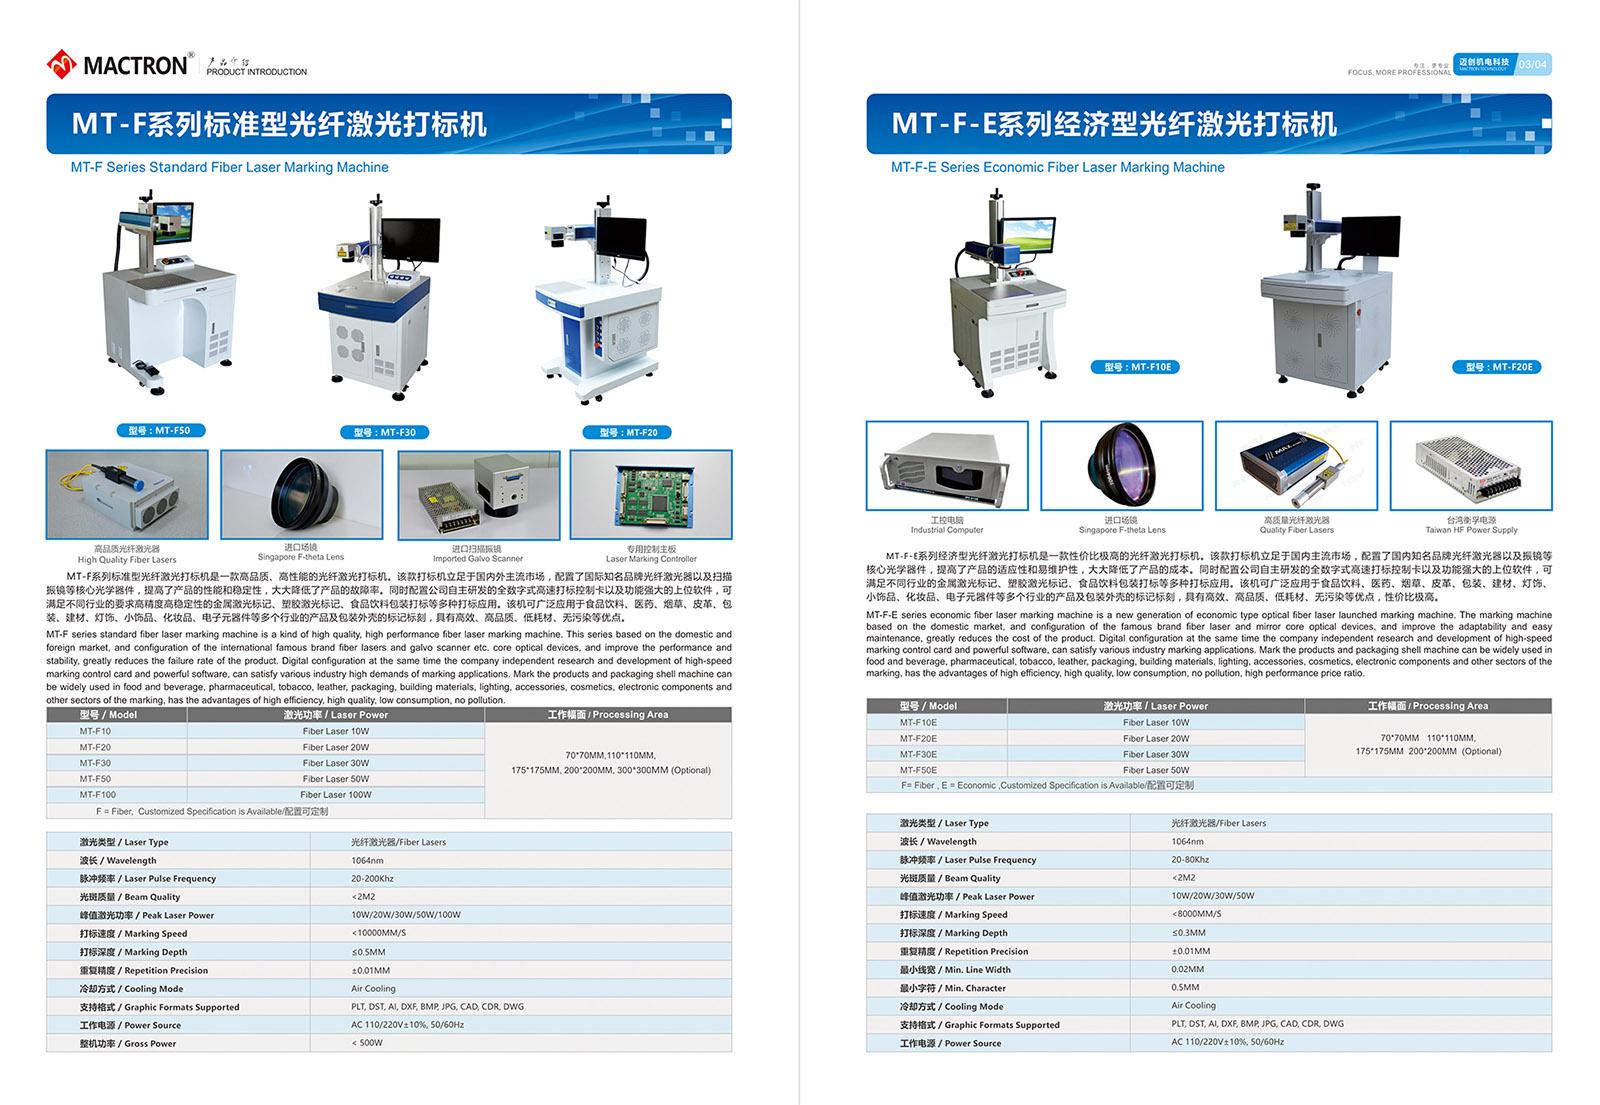 Mactron Tech Laser Catalogue 2017 (3)